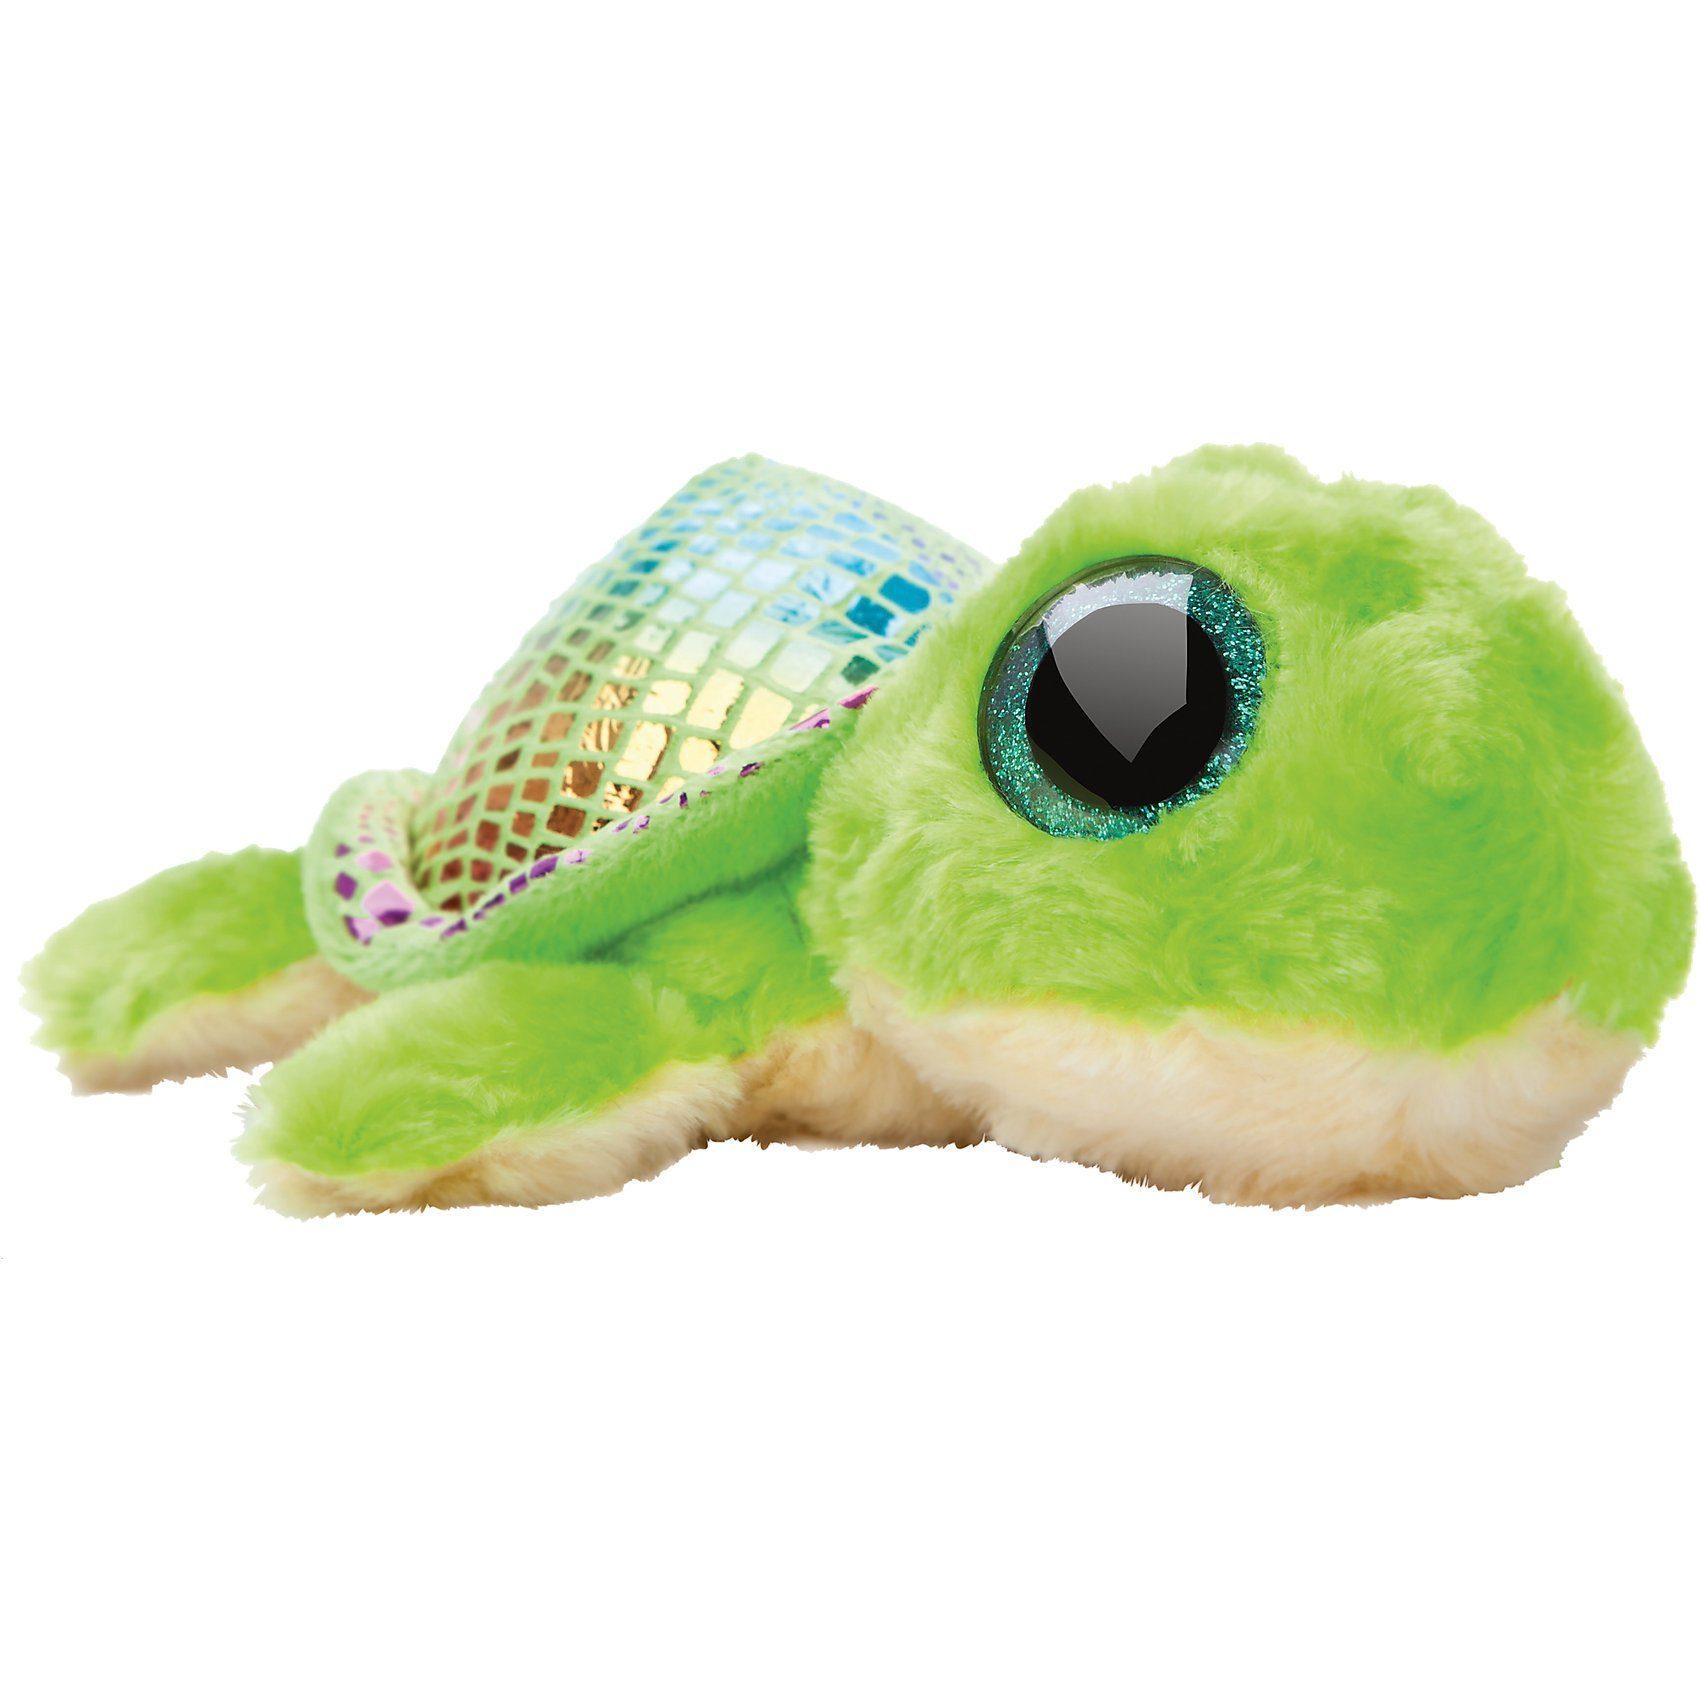 YooHoo Flippee Schildkröte grün, 16,5cm